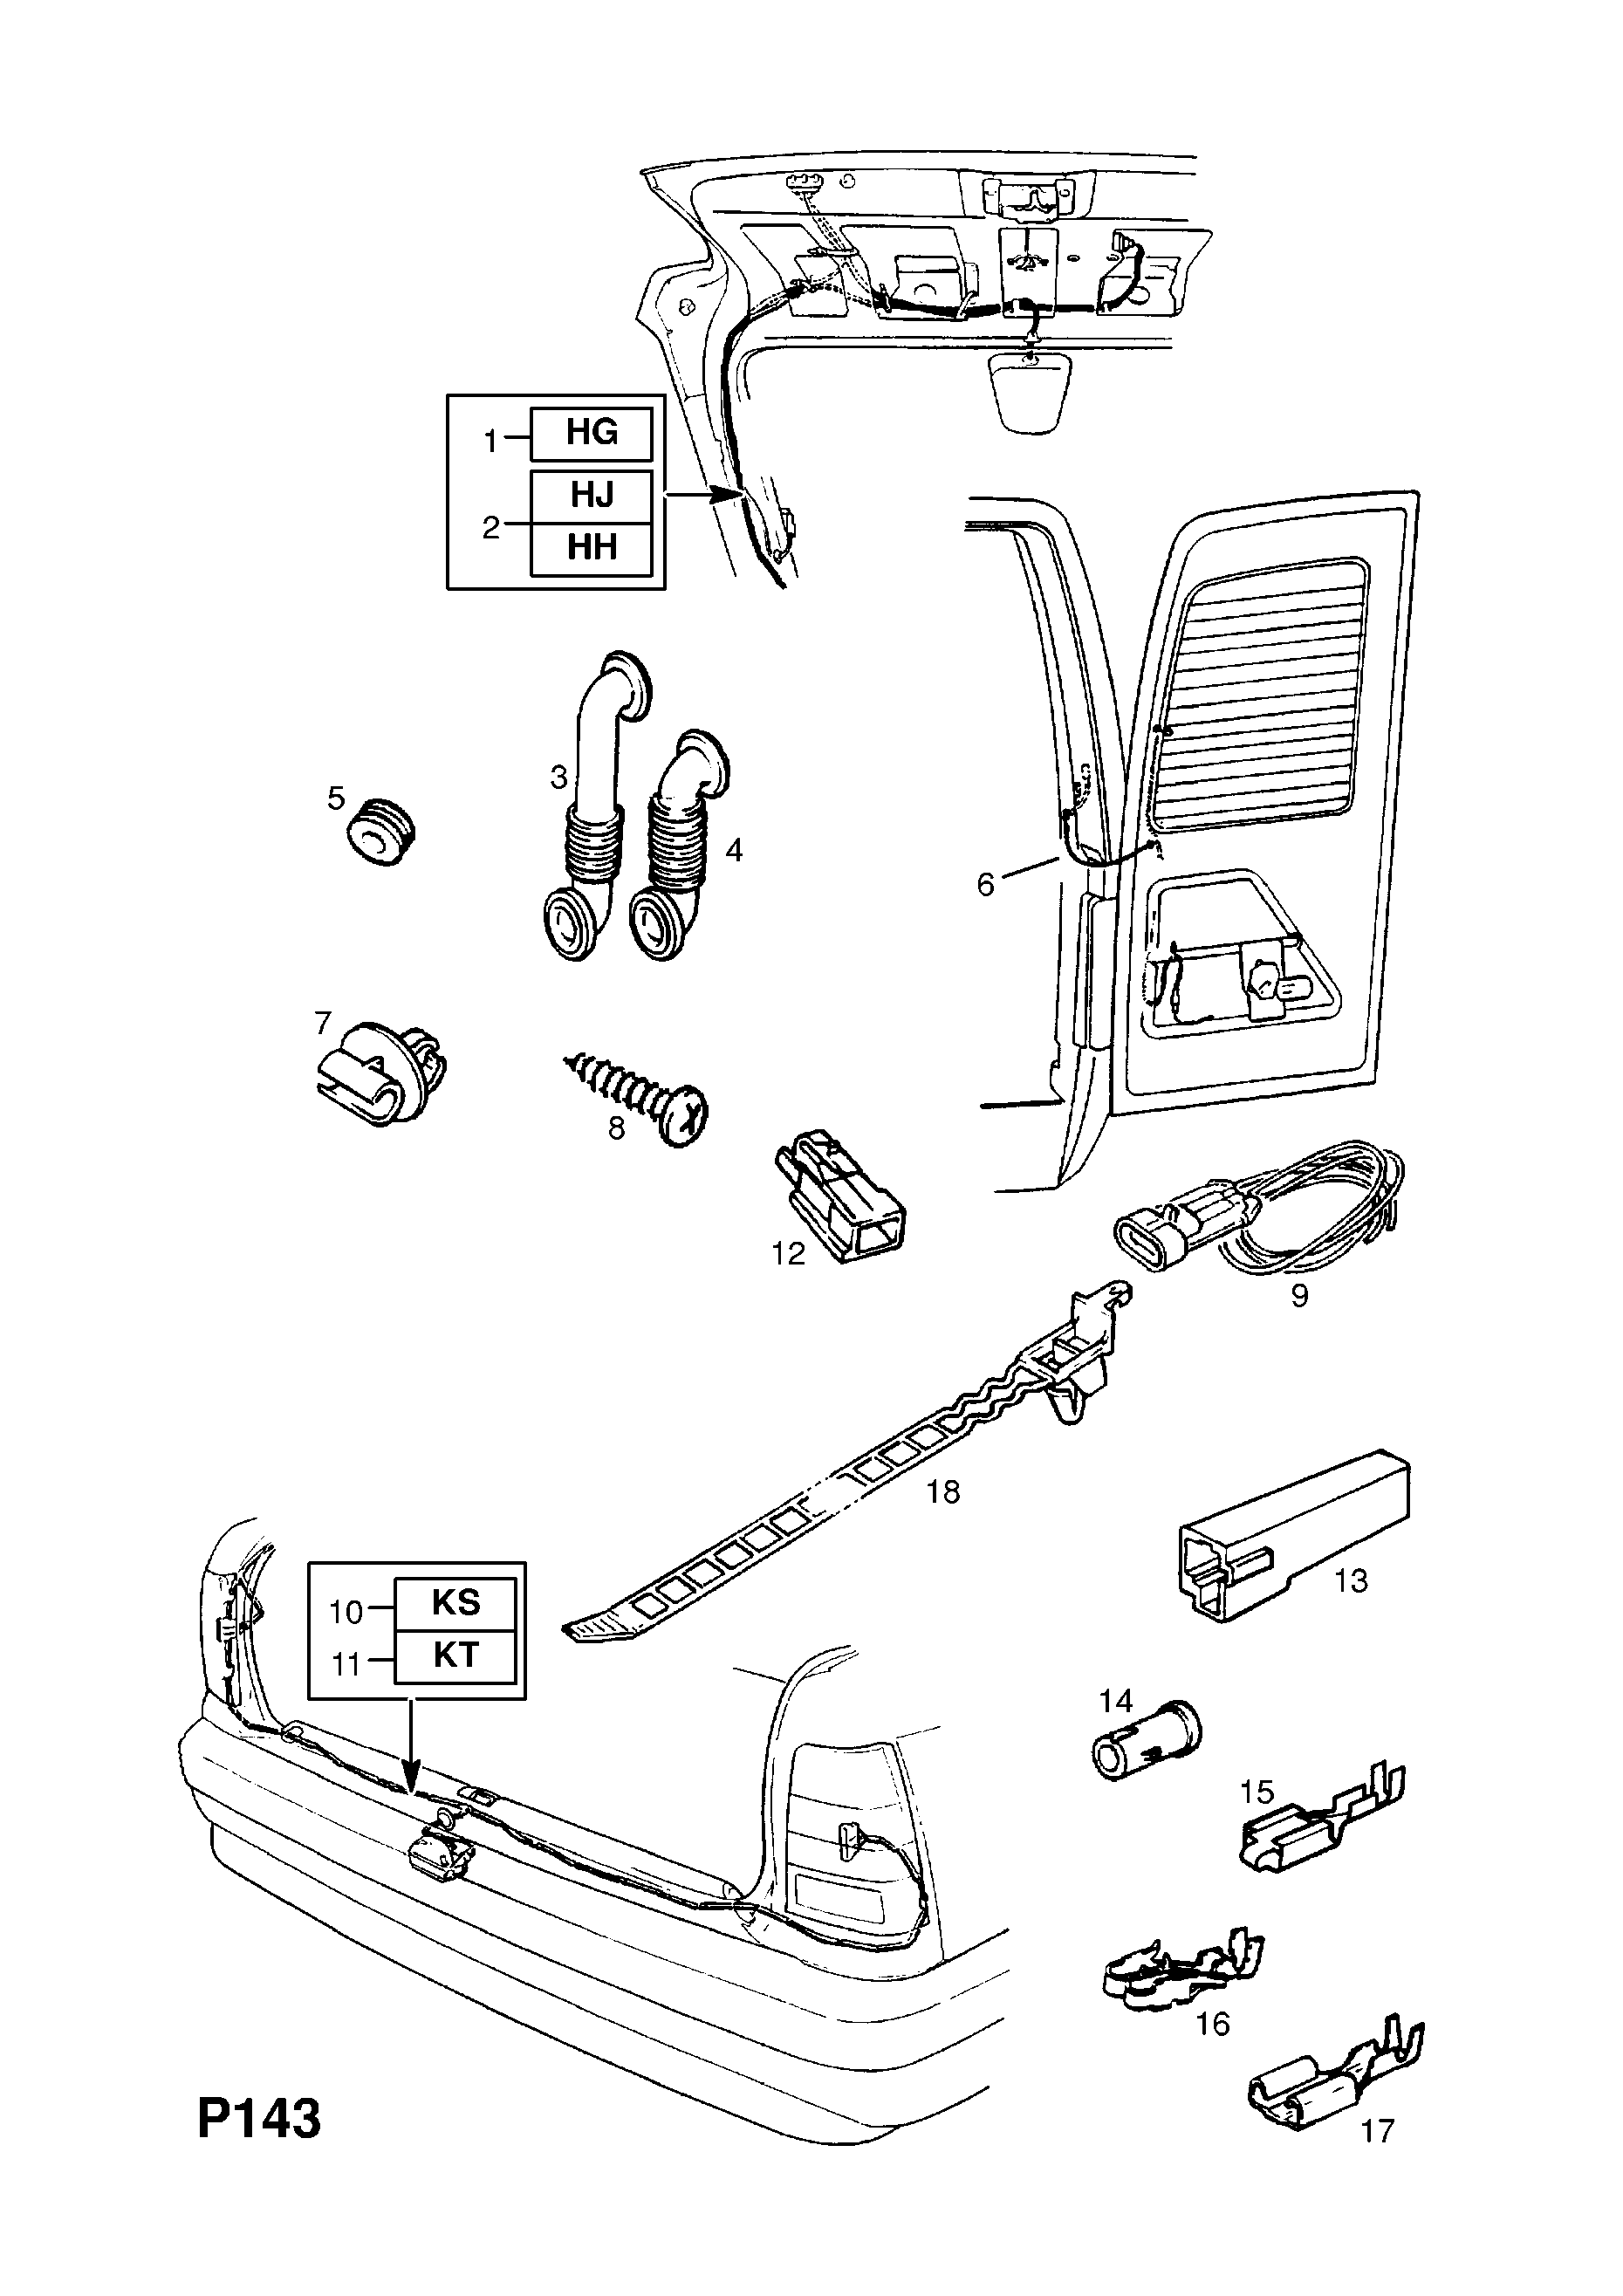 Opel Kadette E 1985 1993 P Electrical 8 Wiring Harness 71 Lift Gate Diagram Gm Part Number Genuine Description Range Tail